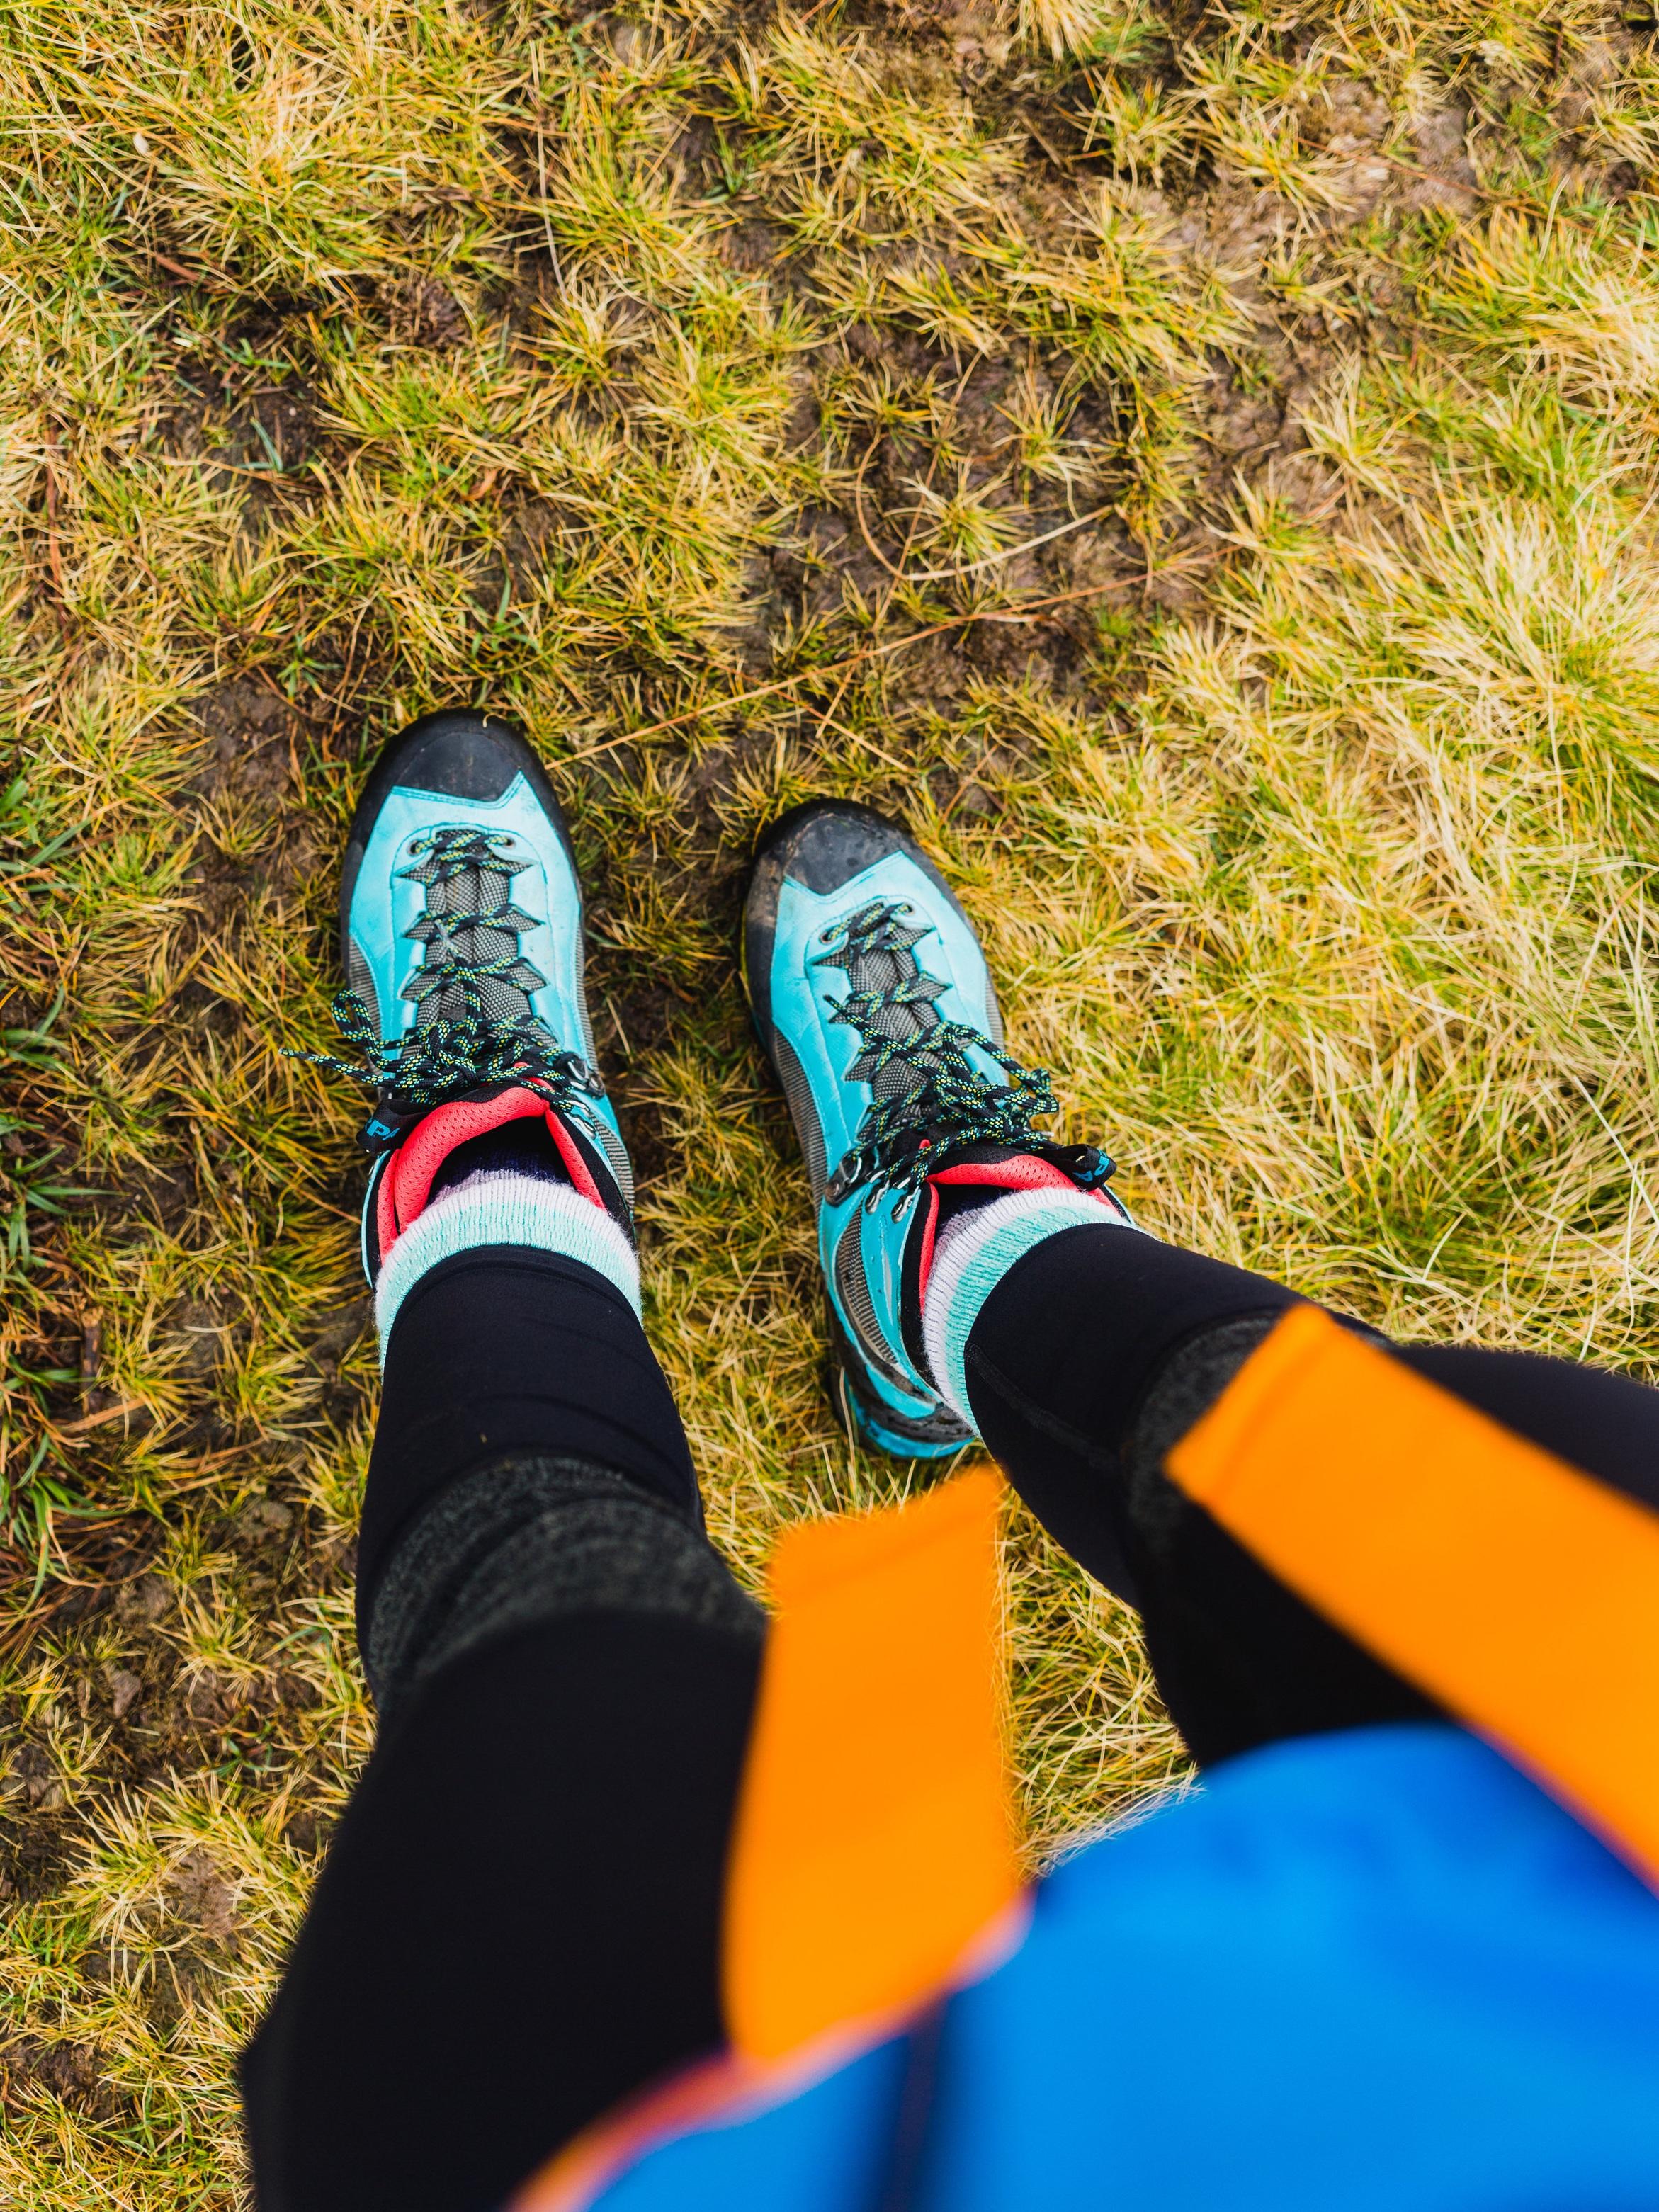 Scarpa Charmoz Mountain Boots